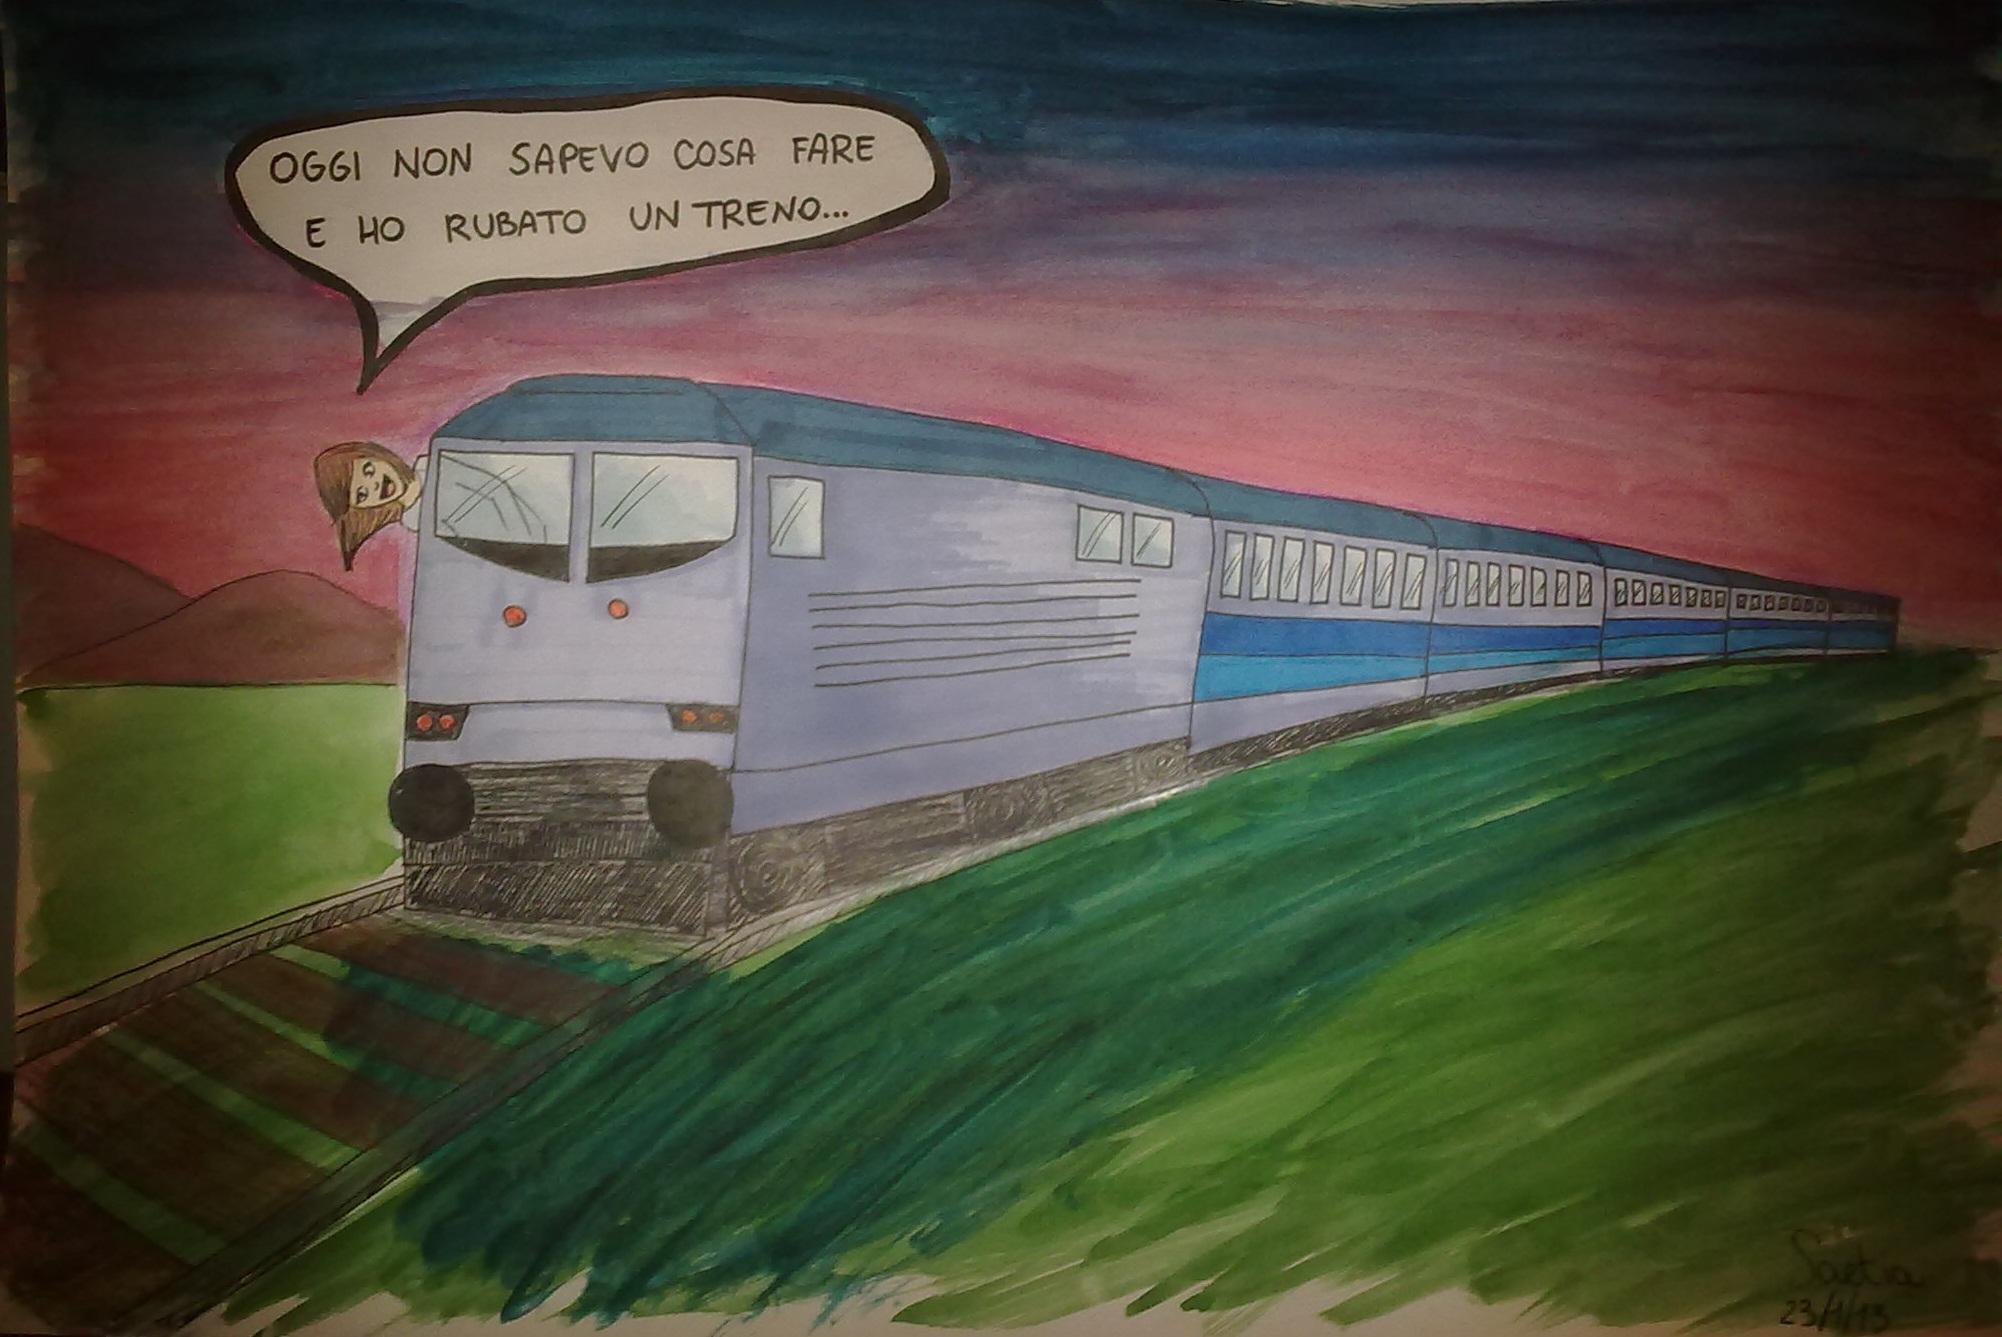 The train of destiny